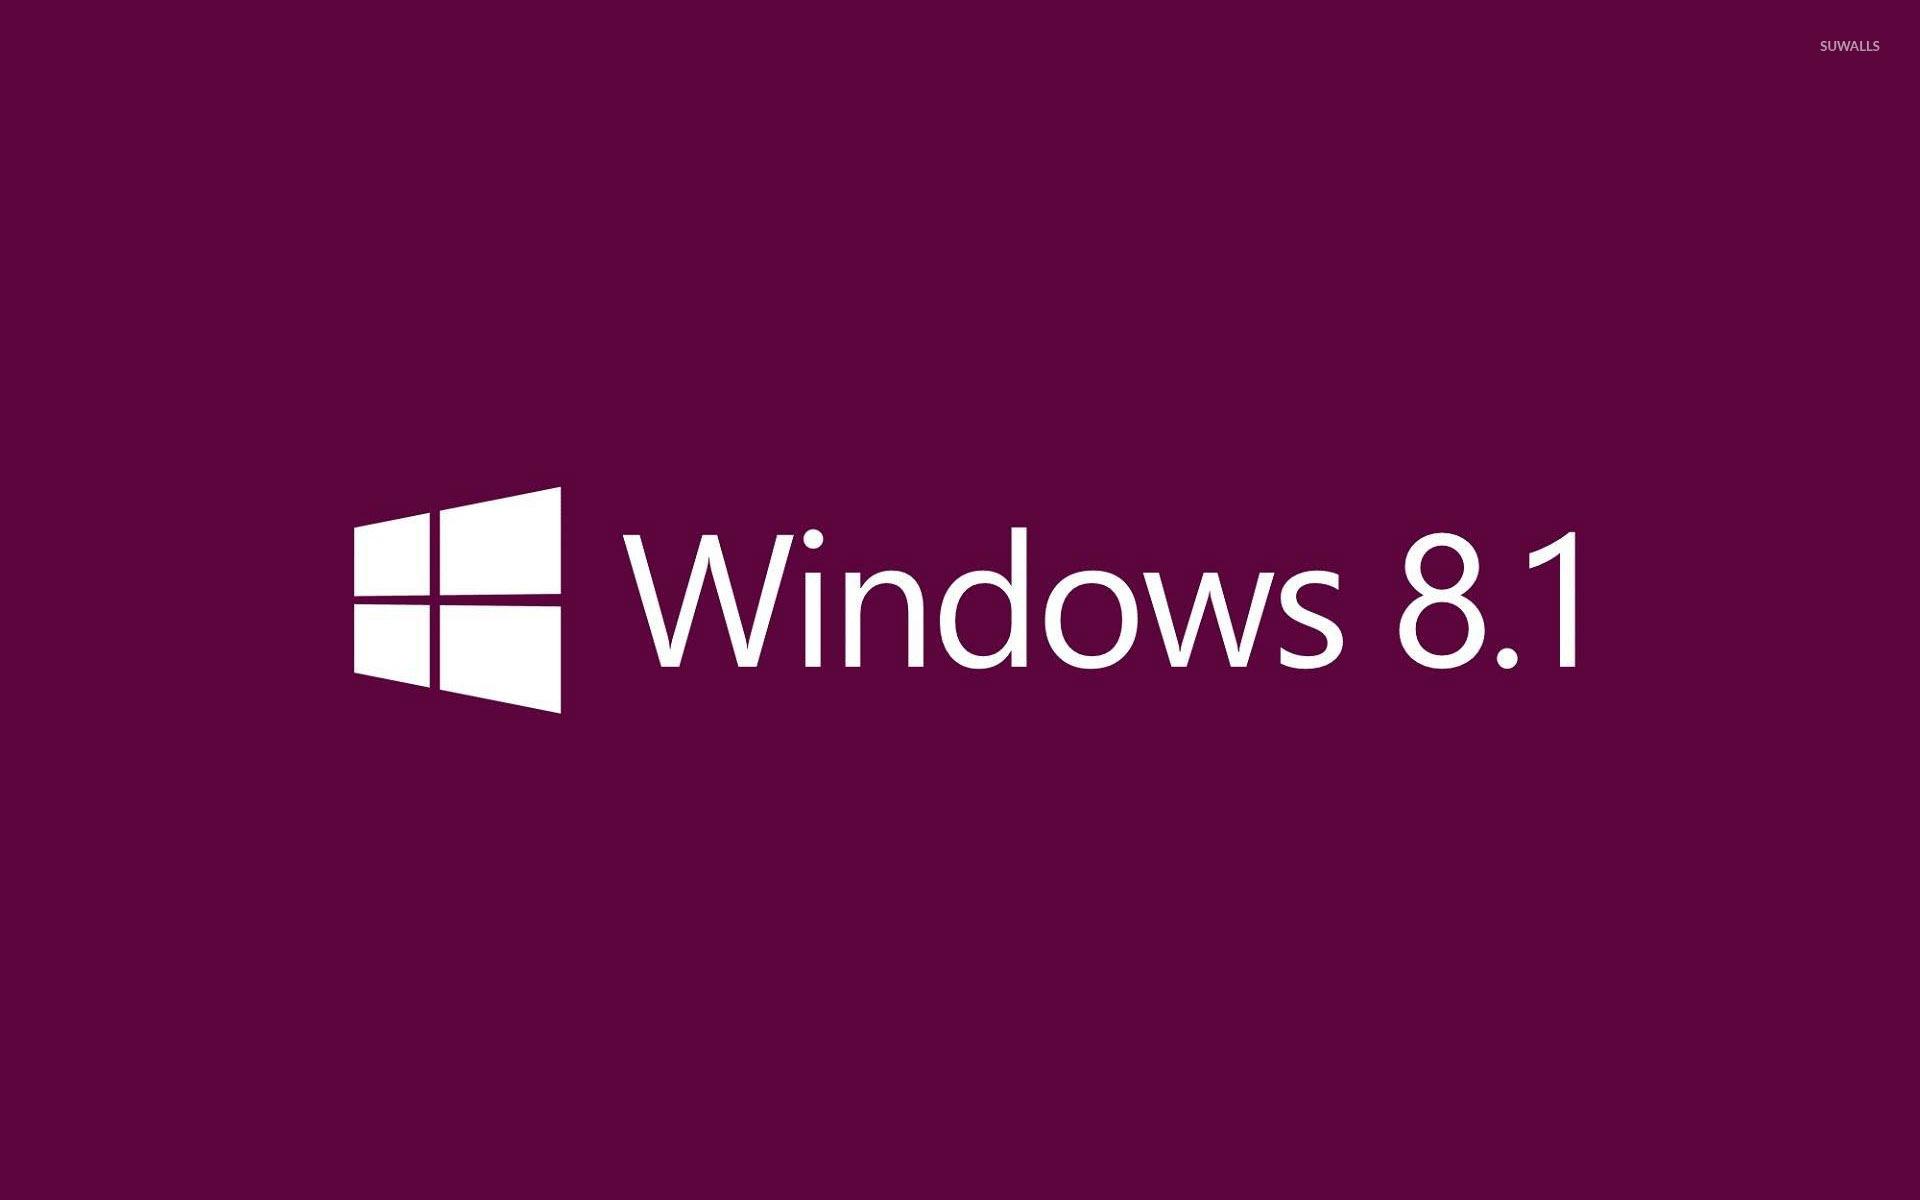 windows 8.1 [6] wallpaper - computer wallpapers - #27797